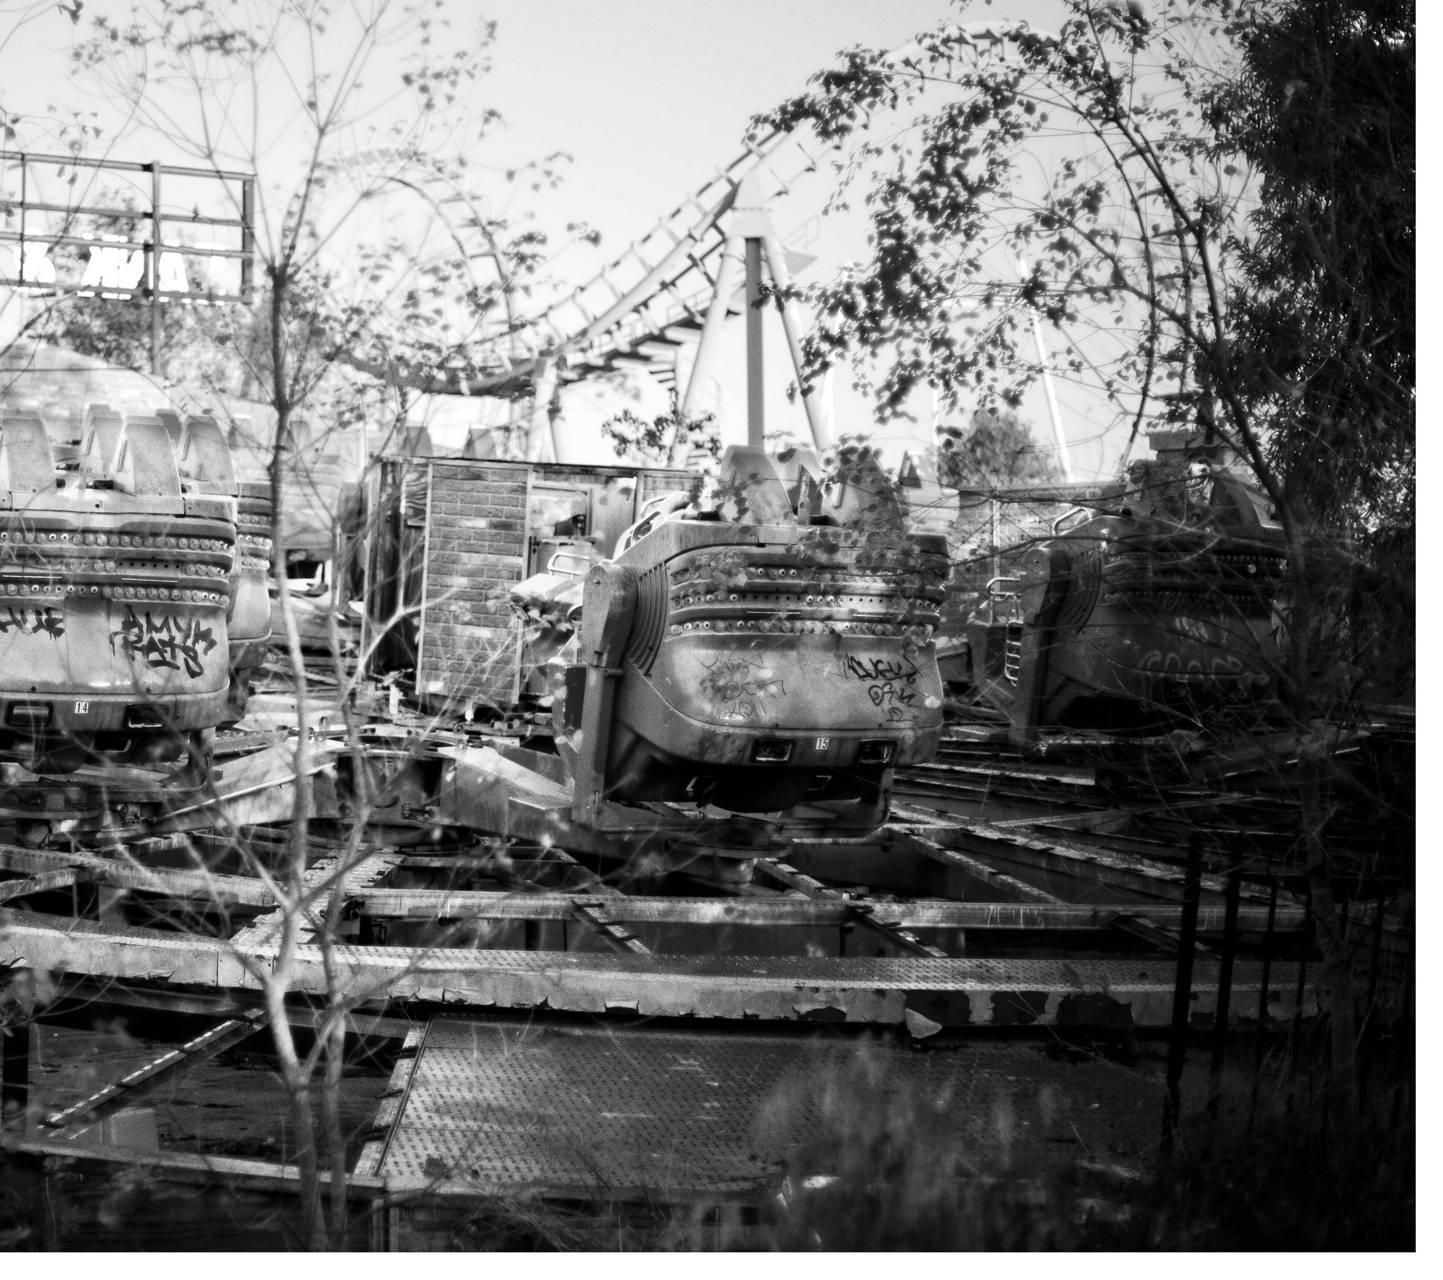 Abandoned park 1